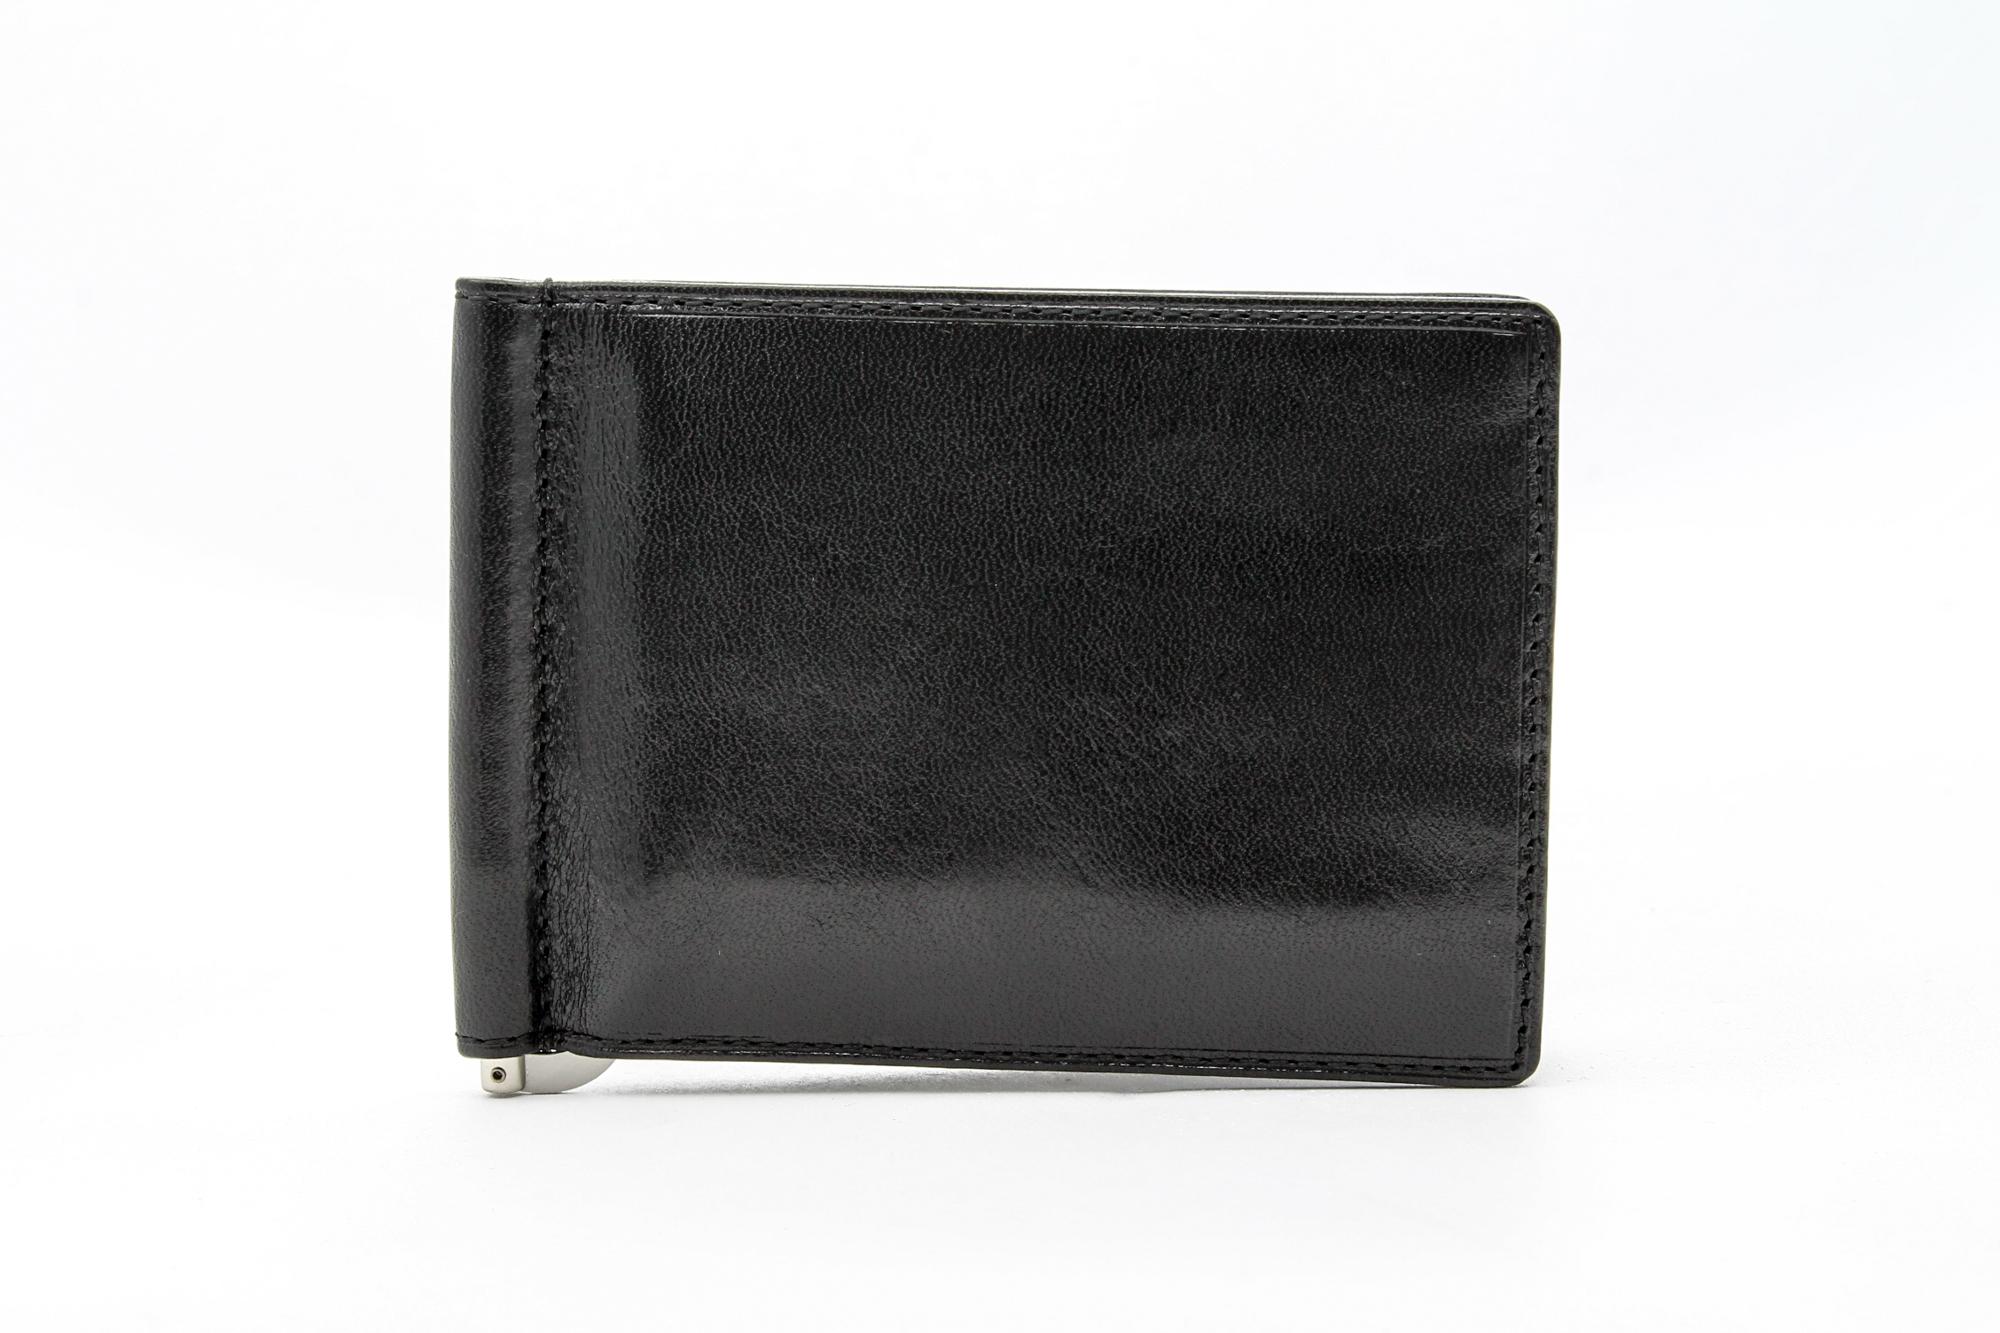 Tony-Perotti-Italian-Leather-Executive-Credit-Card-Money-Clip-Wallet thumbnail 4